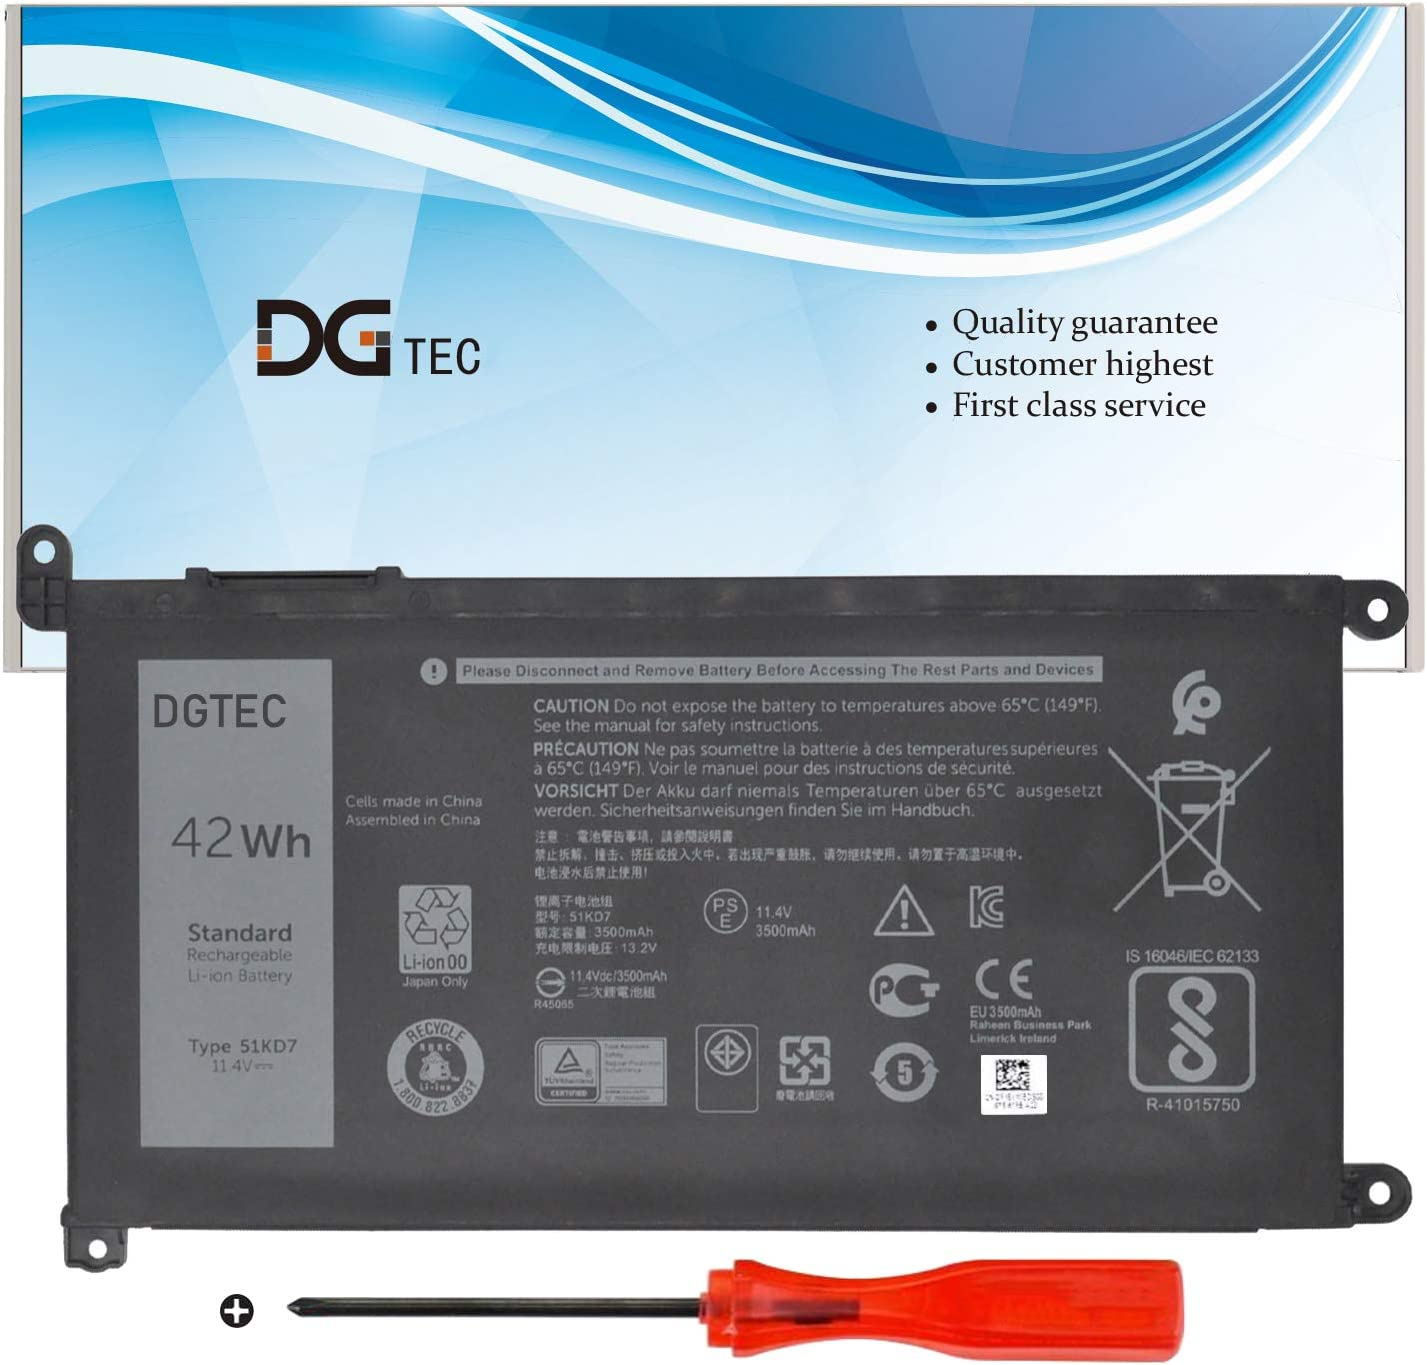 DGTEC 51KD7 Laptop Battery Replacement 31 depot for 11 Chromebook Dell Cheap SALE Start